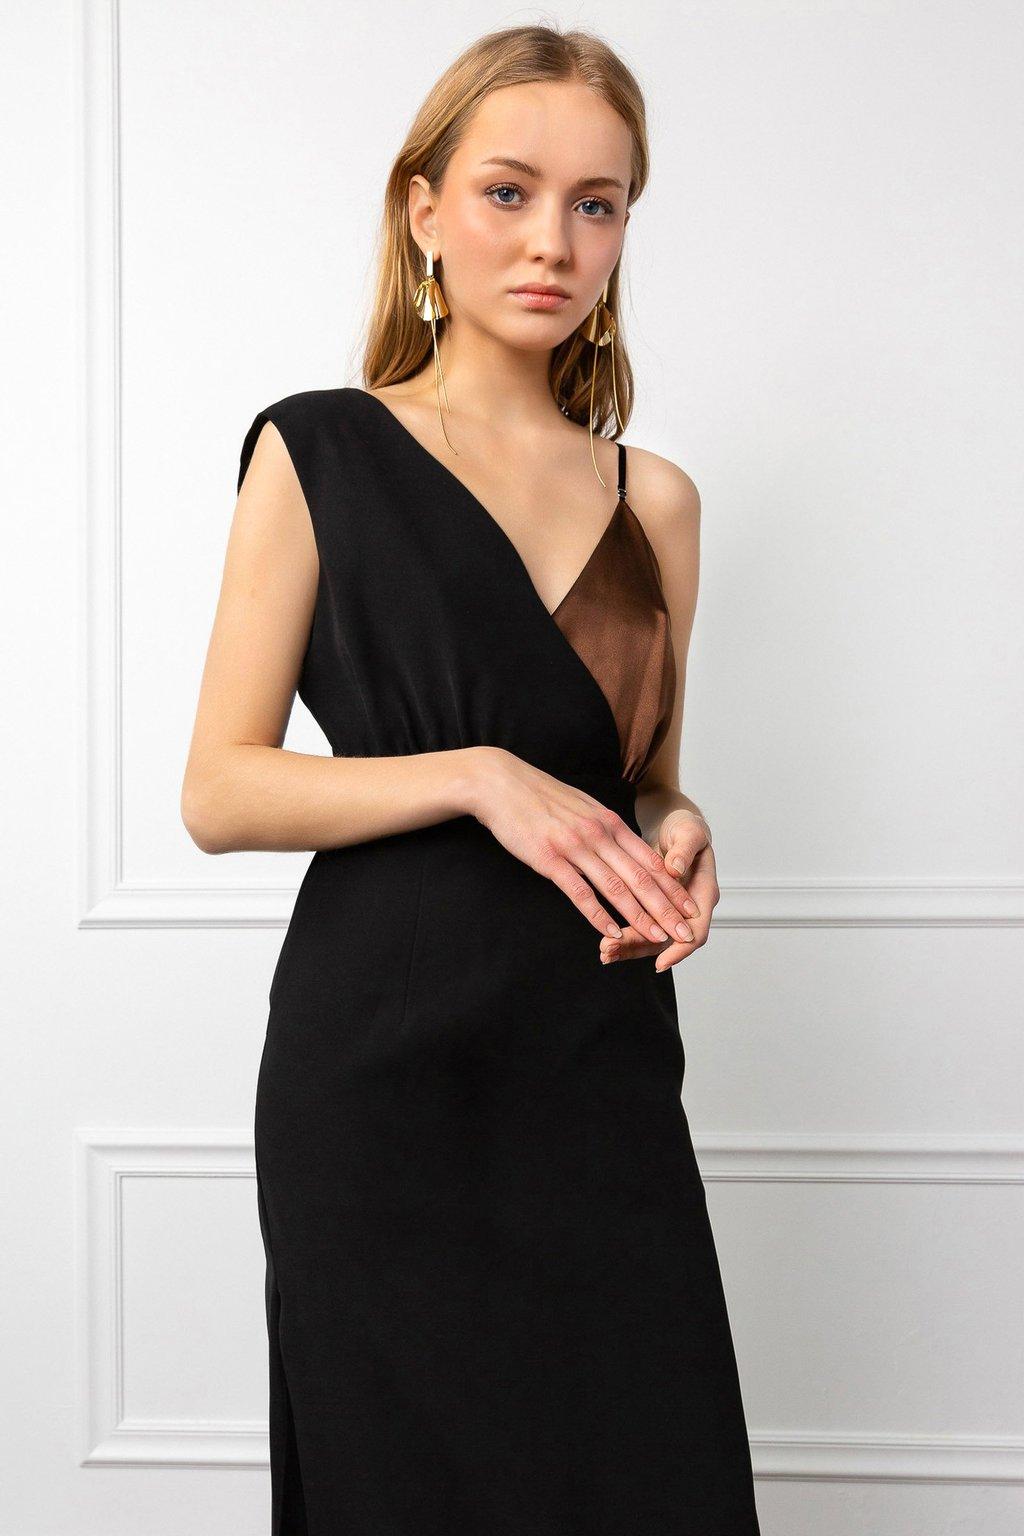 Lily Dress by J.ING women's fashion clothing